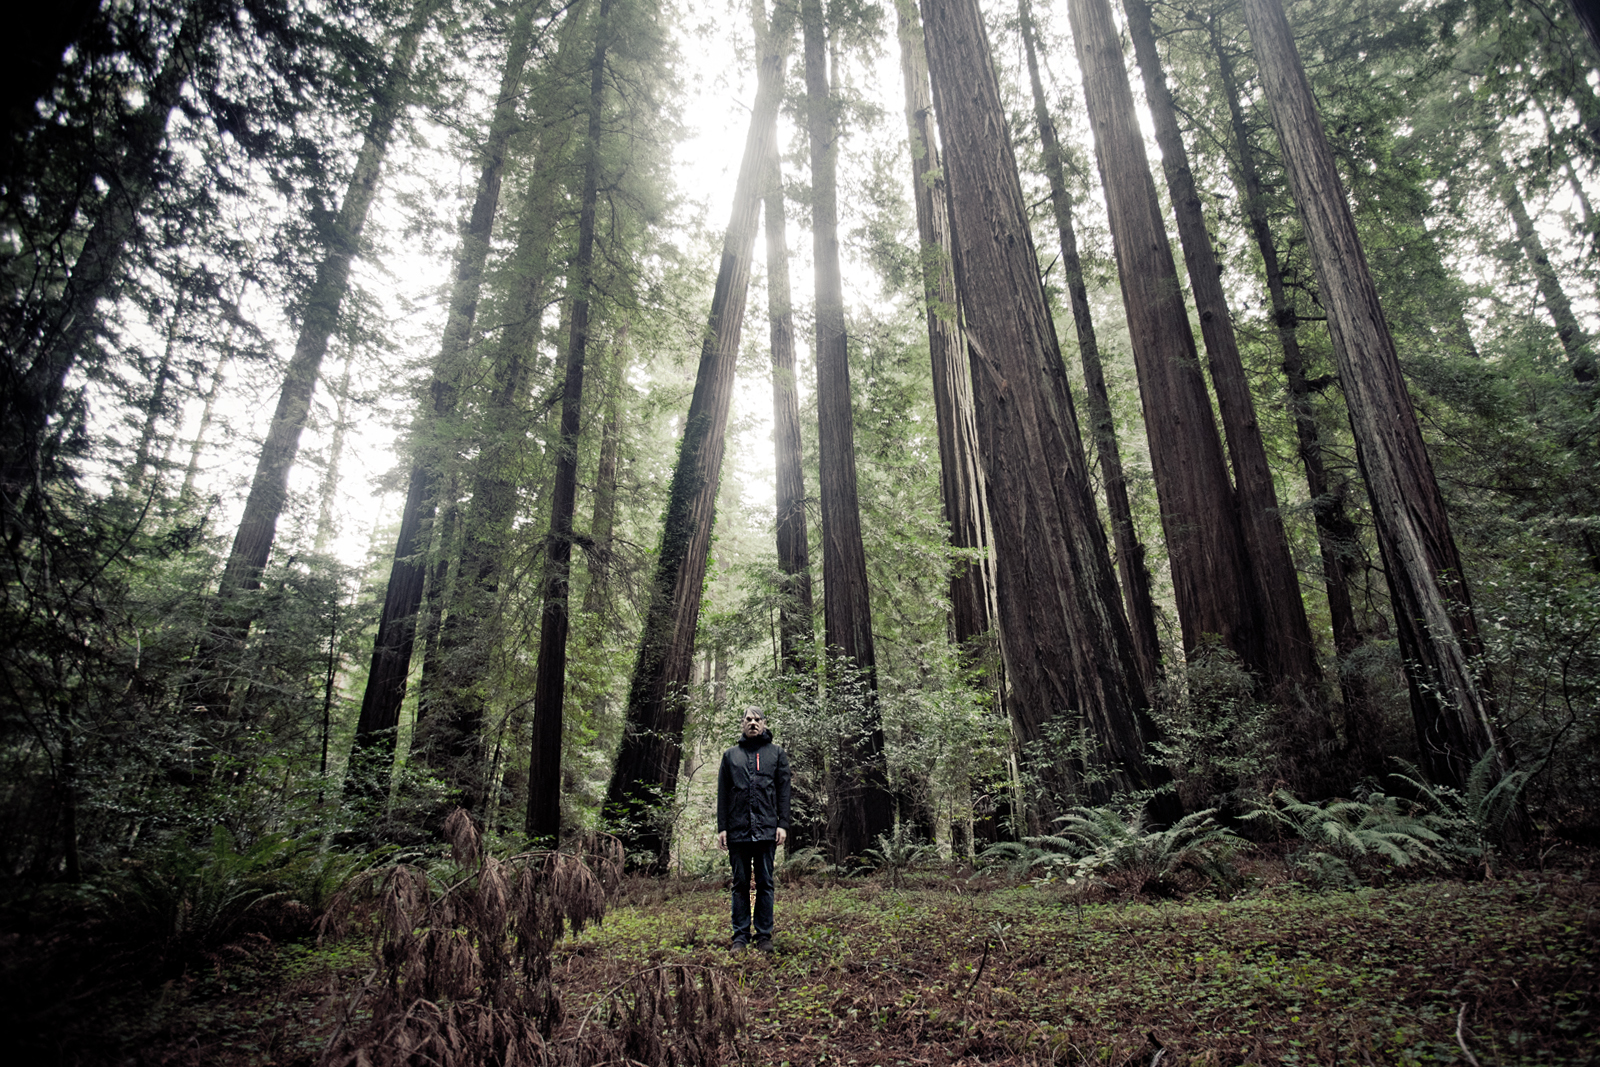 Hitler visiting the Redwoods, California